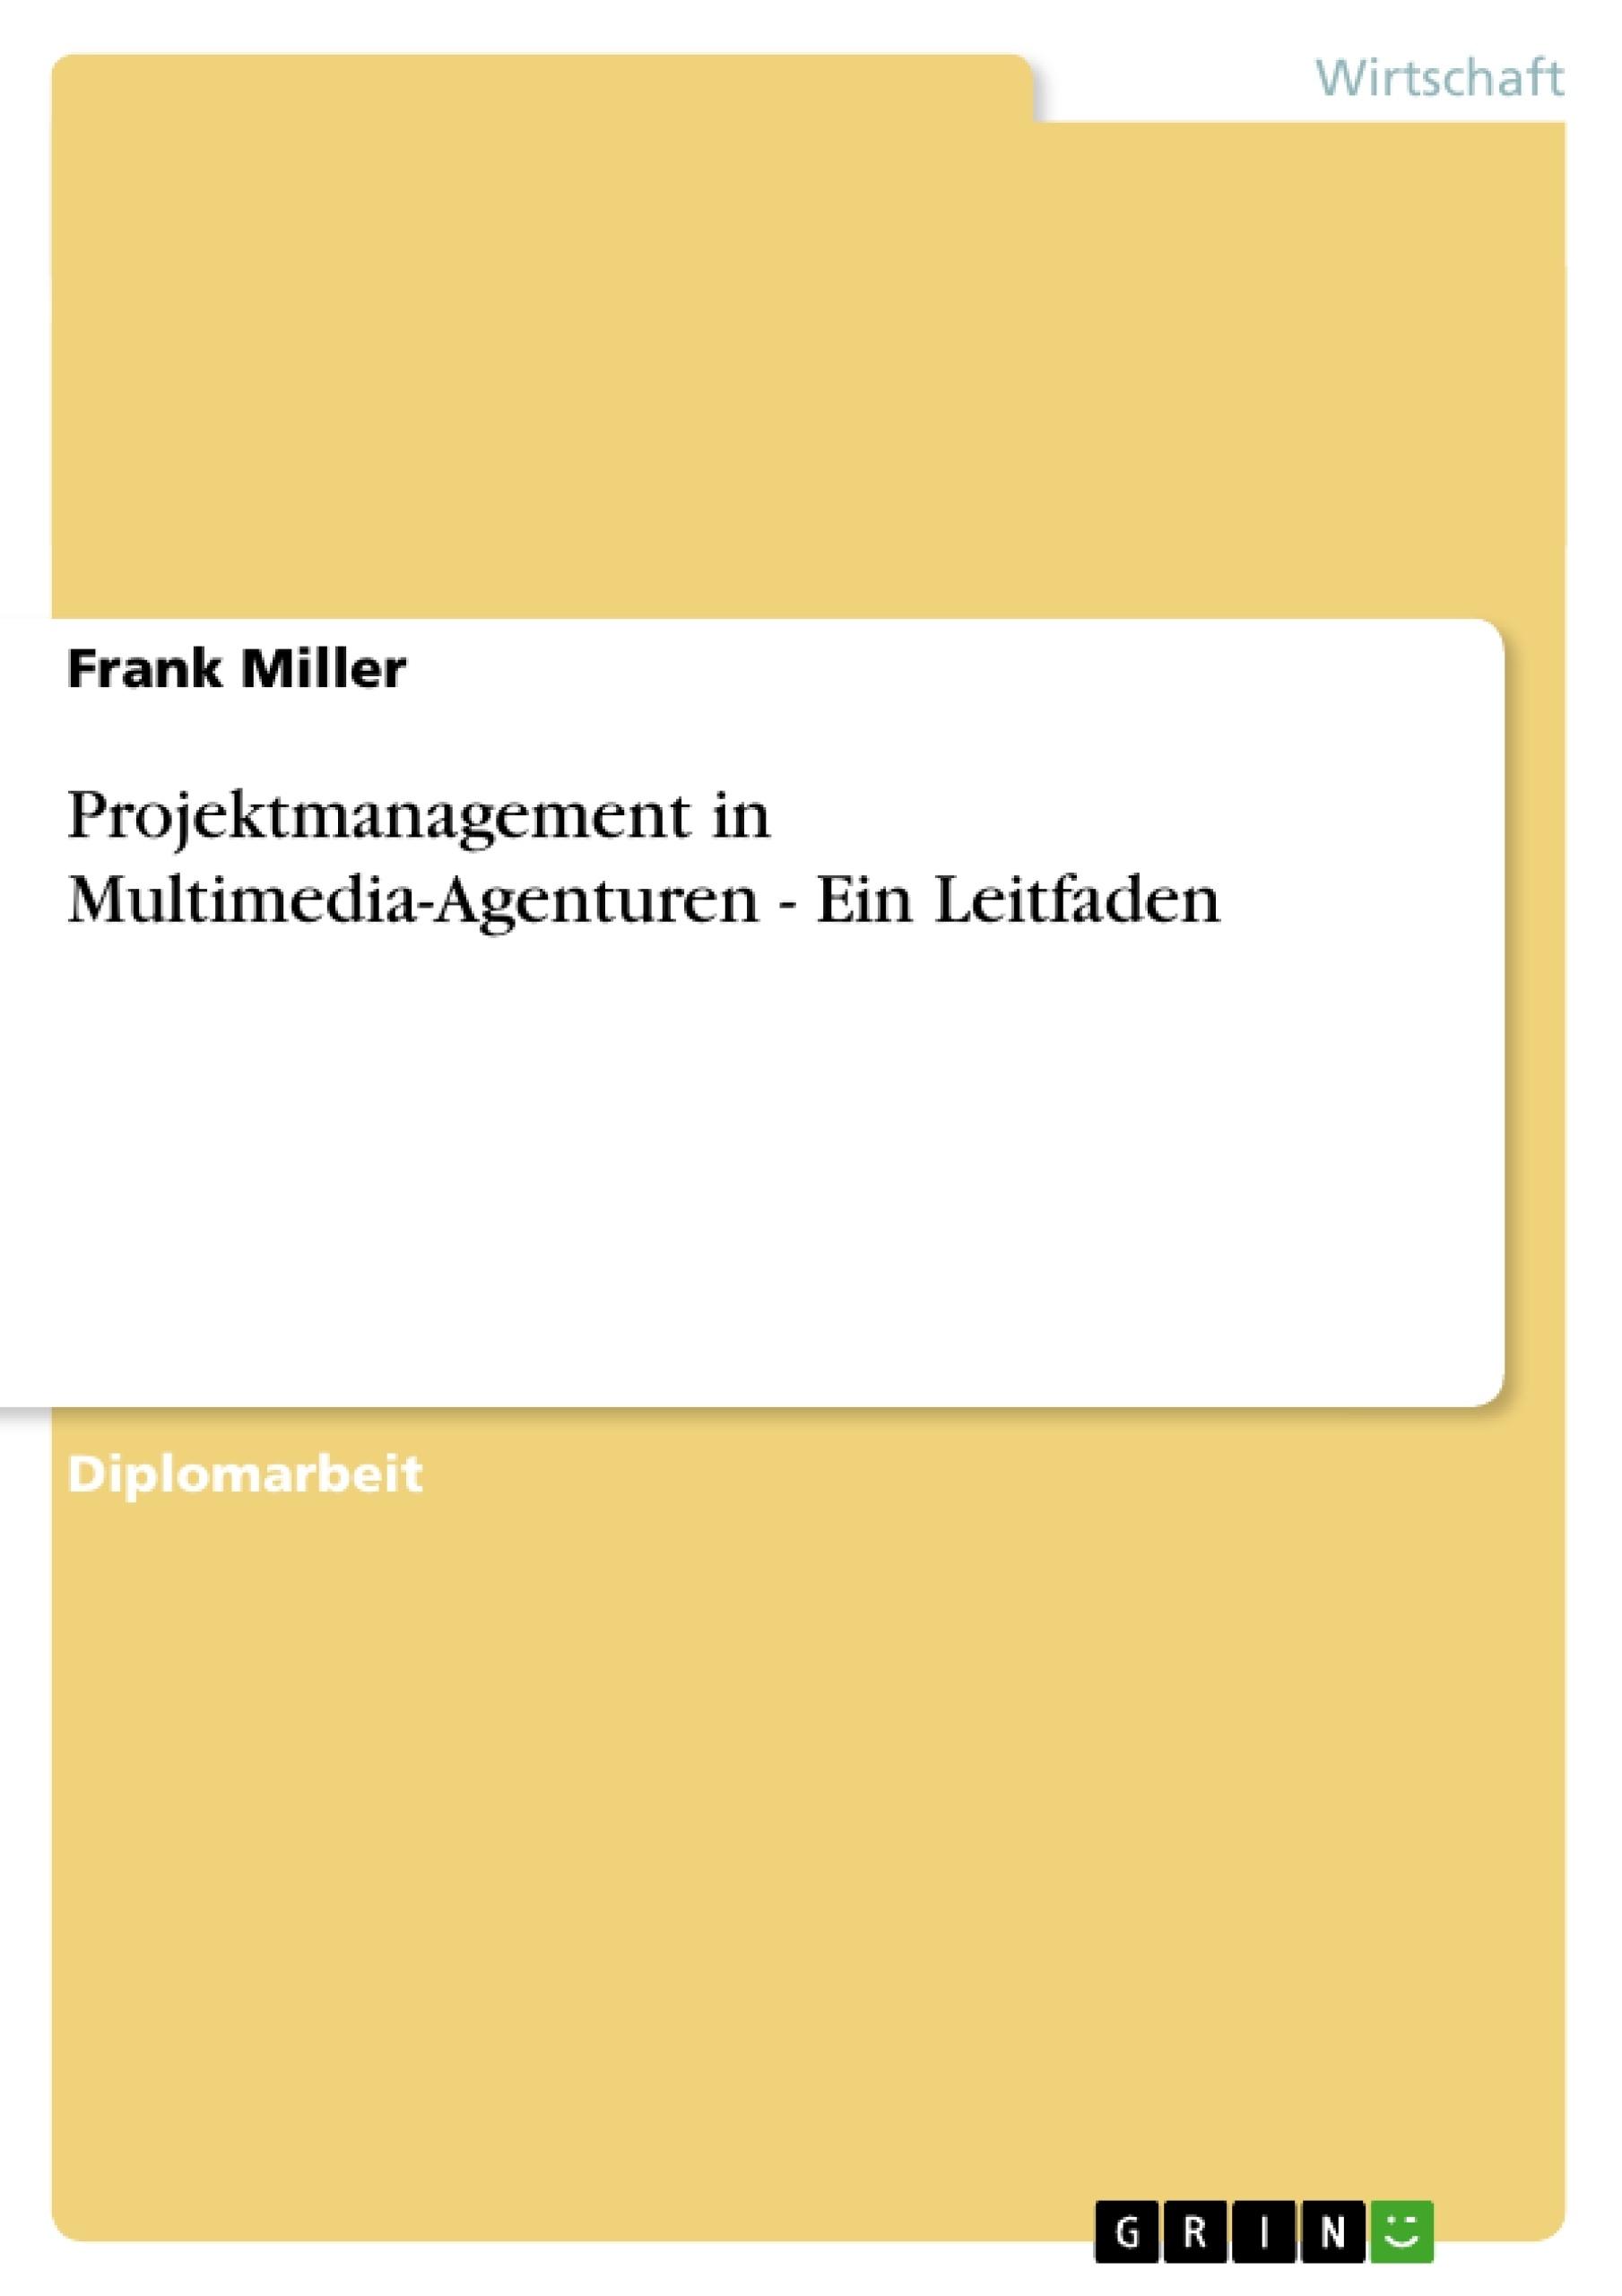 Titel: Projektmanagement in Multimedia-Agenturen - Ein Leitfaden